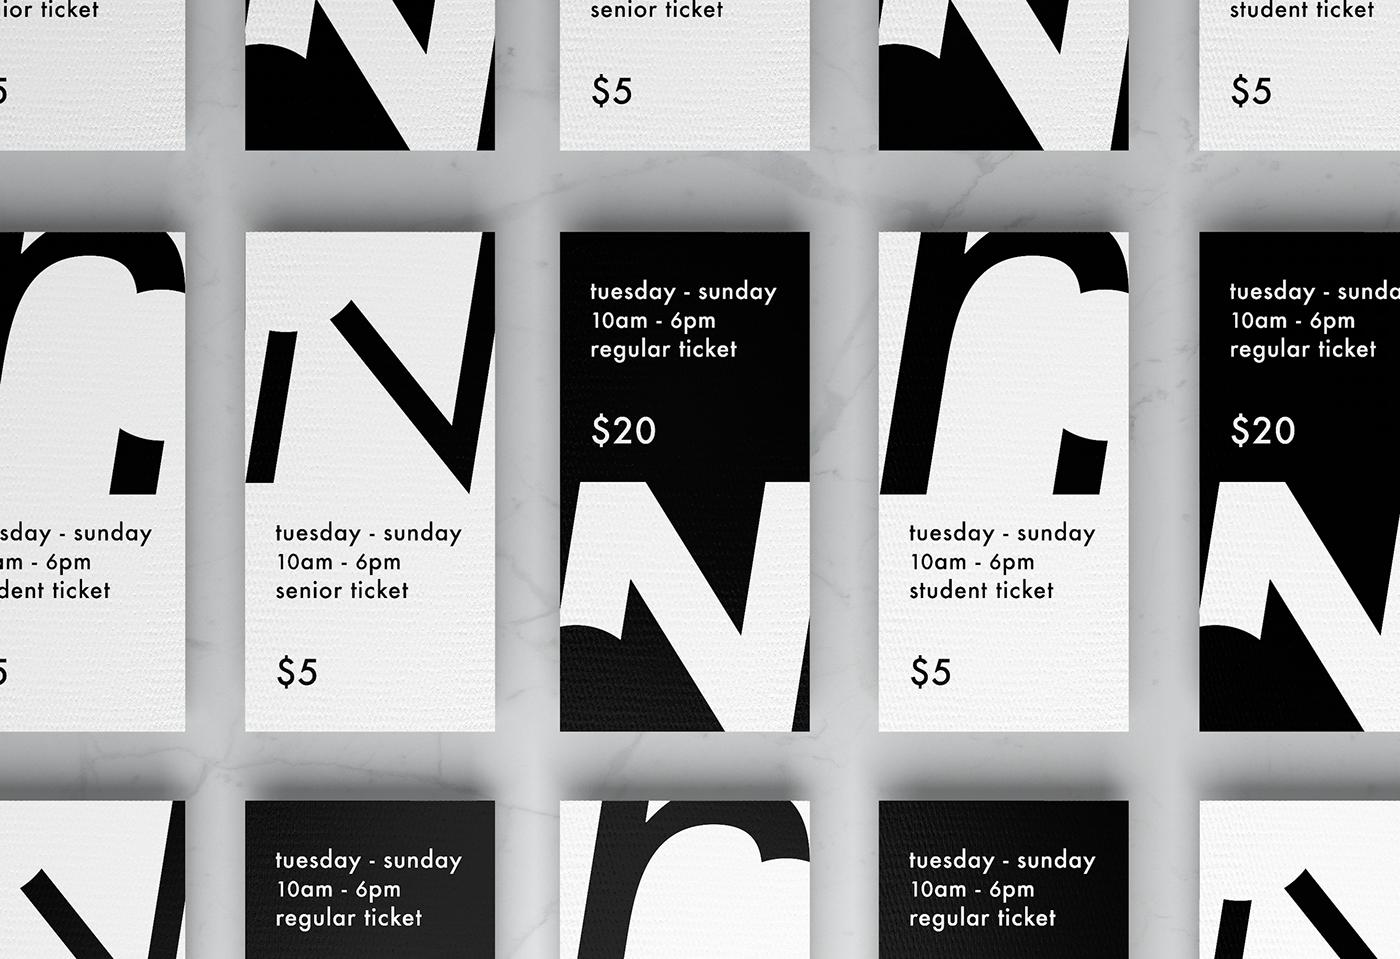 poster ticket exhibit Exhibition  branding  VI Web wayfinding Behance portfolio